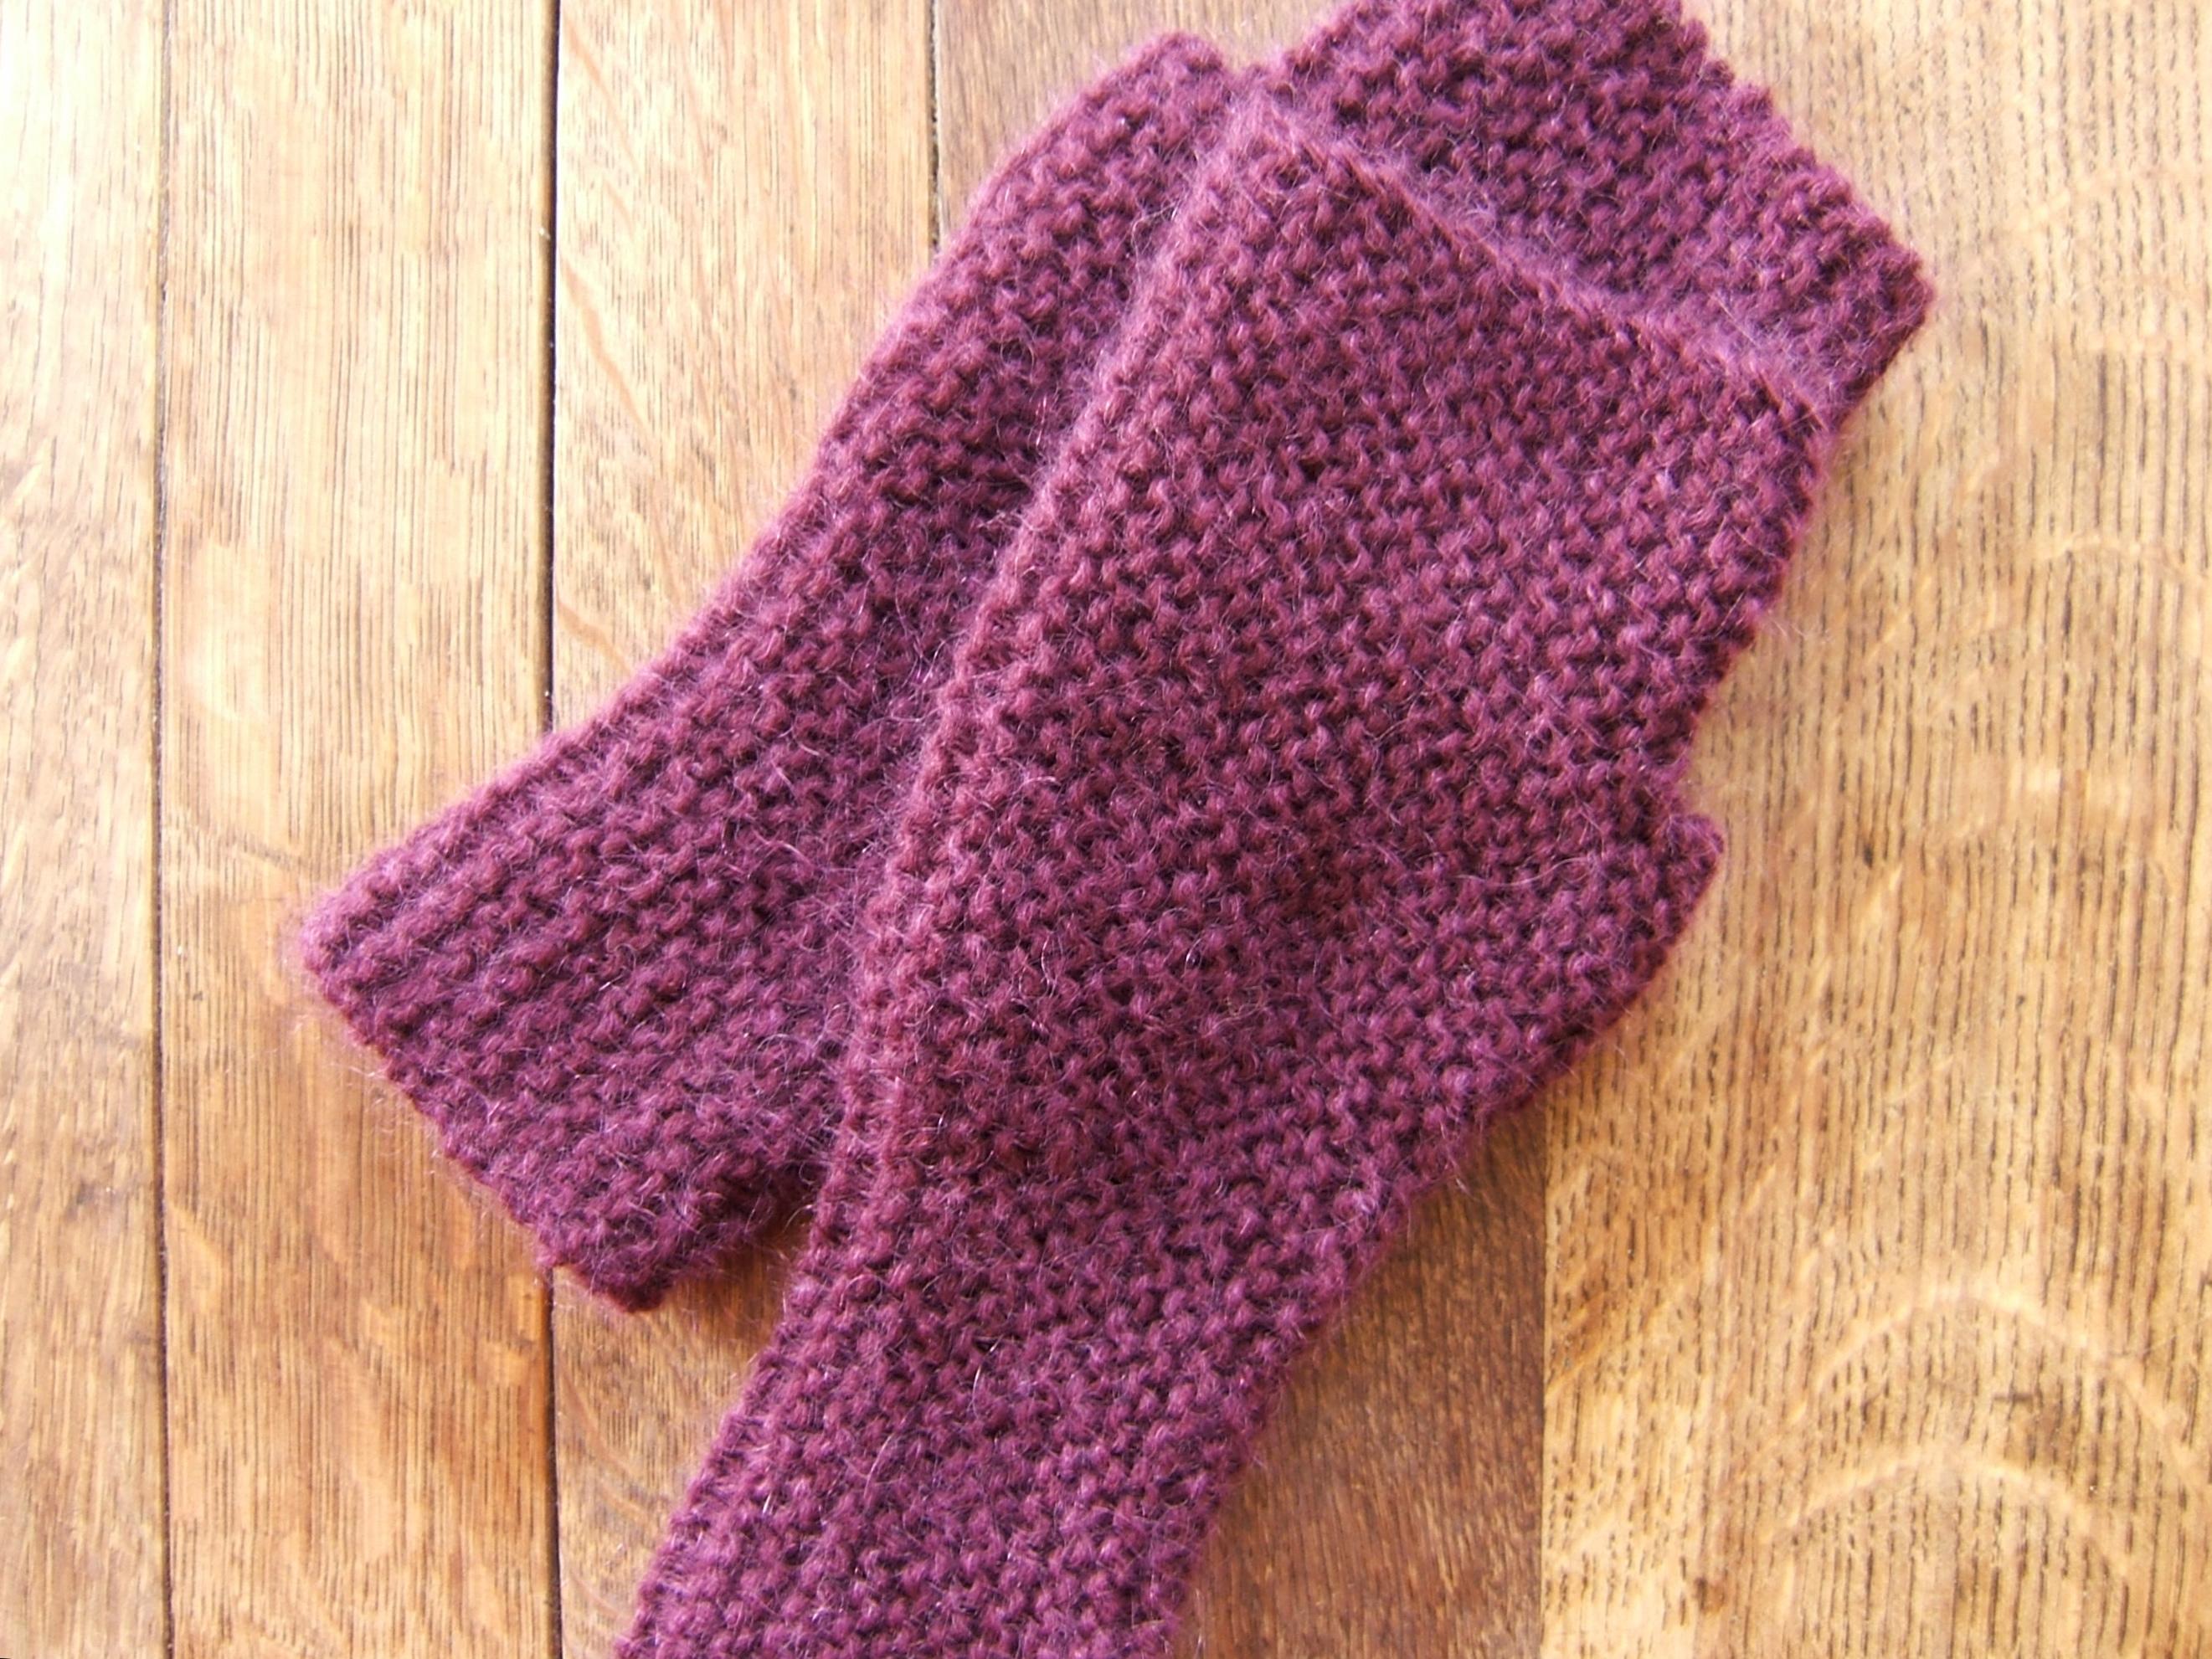 File:Garter stitch mittens.jpg - Wikimedia Commons